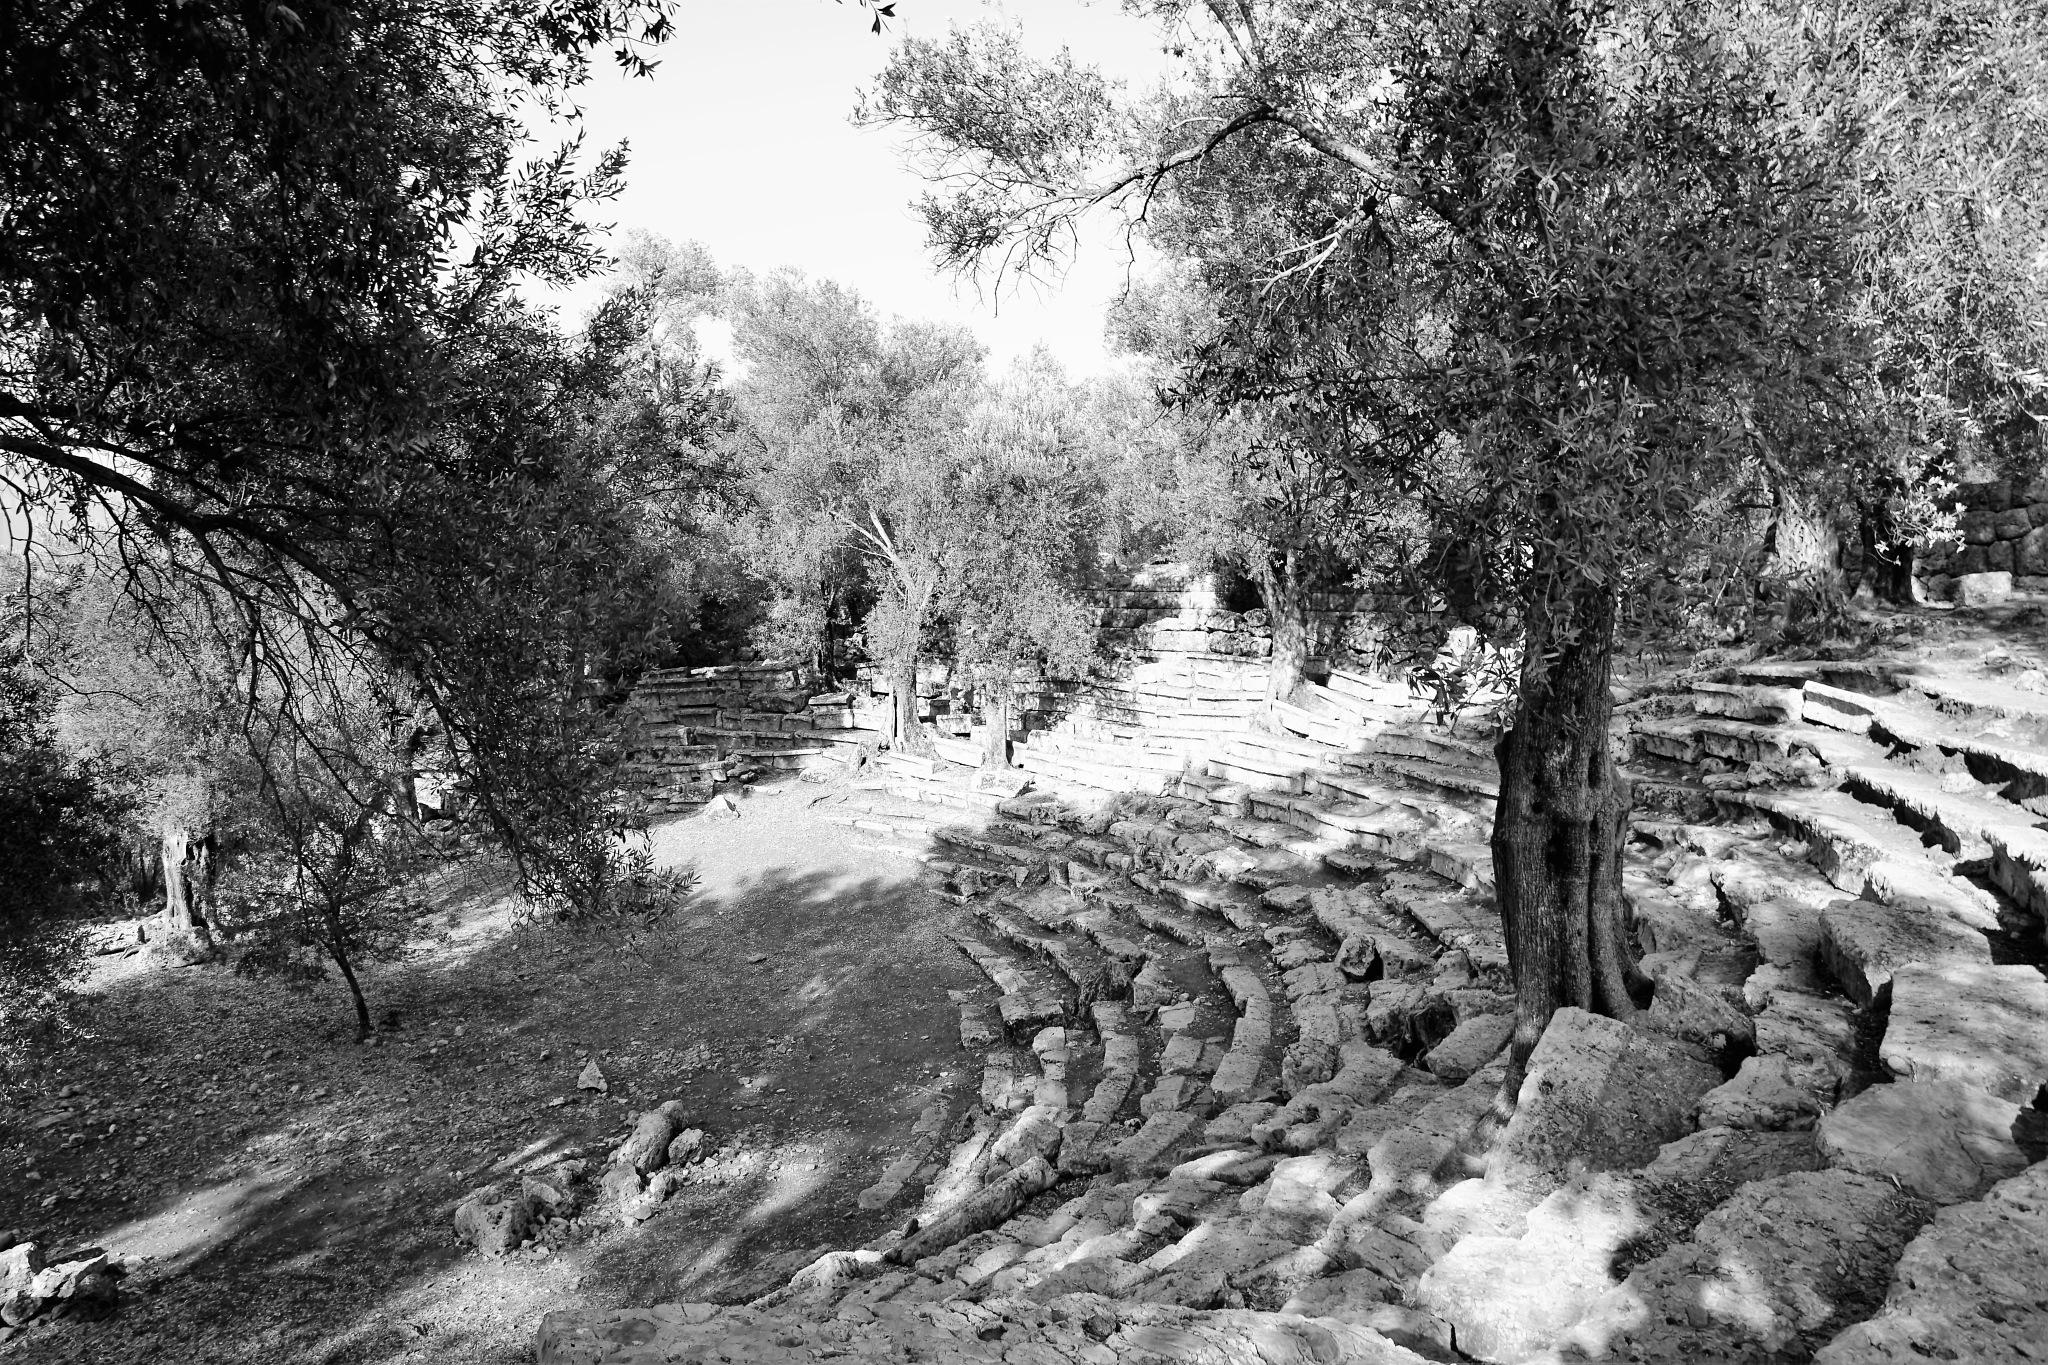 Sedir Island Cedrea 17 by Murat Erkman